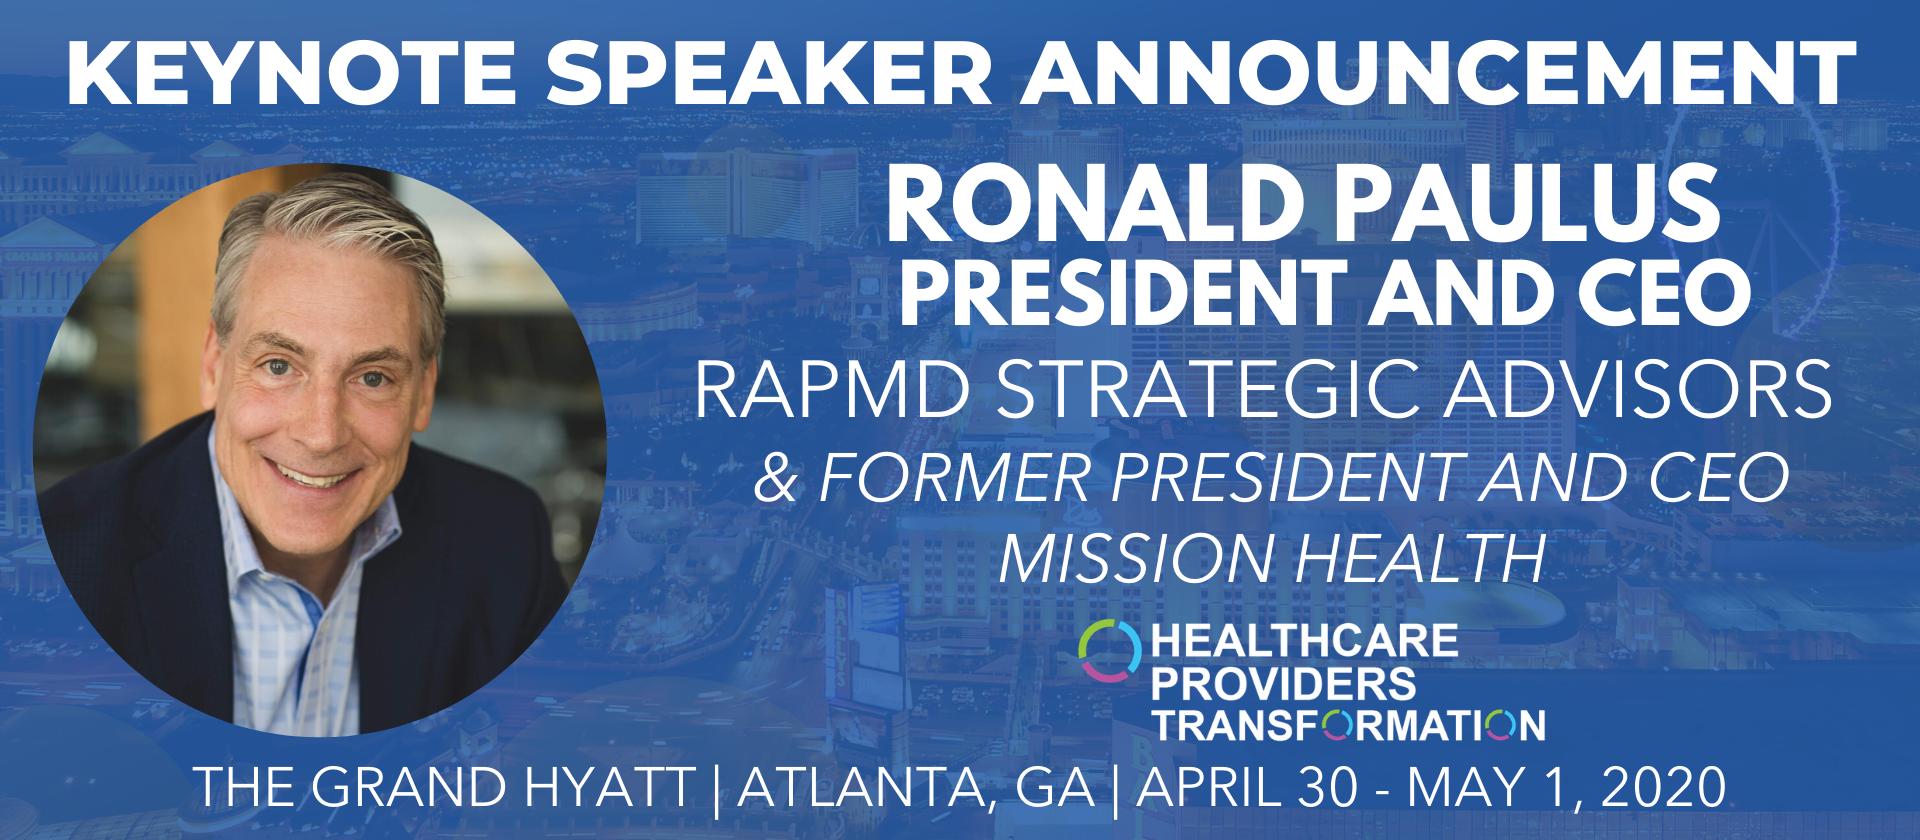 ronald paulus keynote speaker healthcare providers assembly